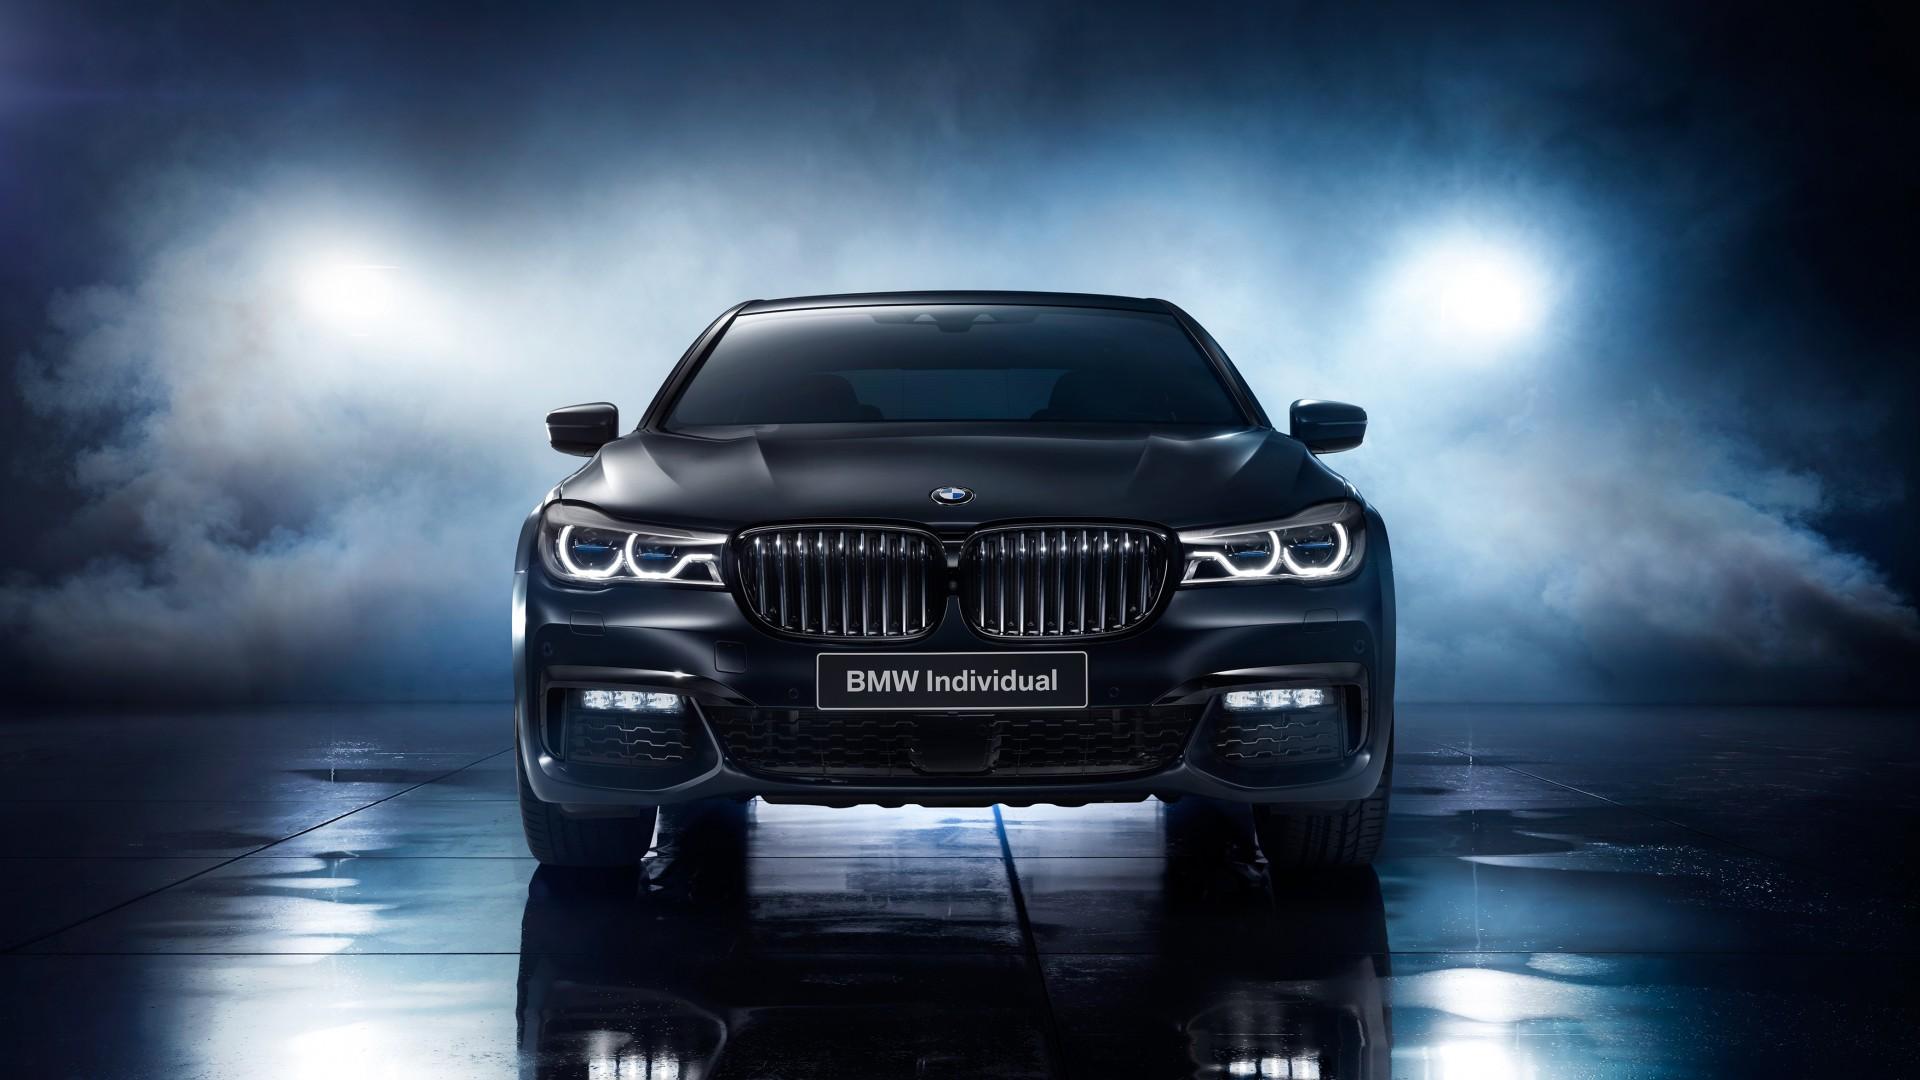 2017 BMW 7 series Black Ice Edition Wallpaper | HD Car ...